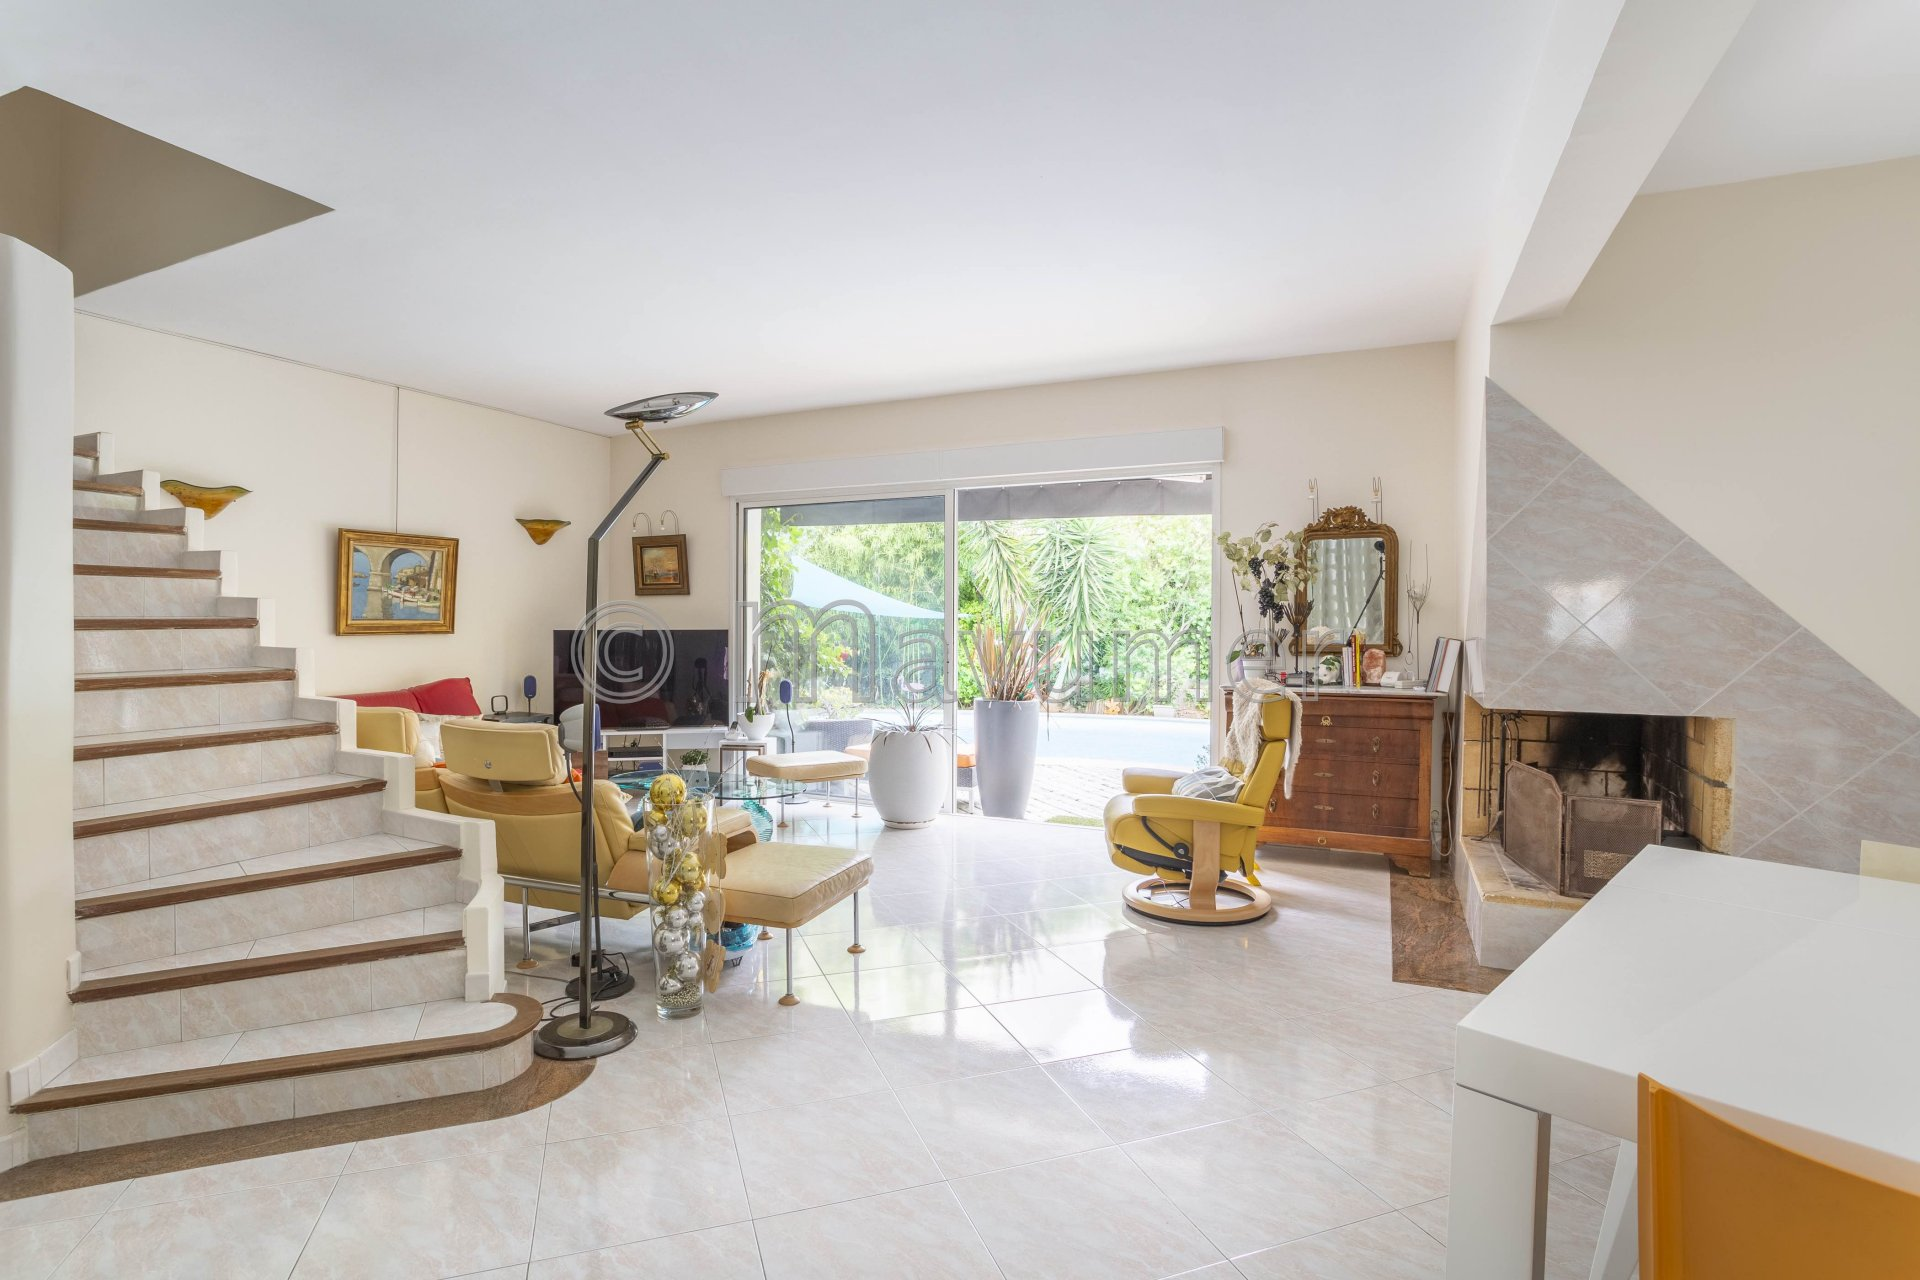 VILLA T6 138m² PISCINE & JARDIN - BORELY 13008 Marseille